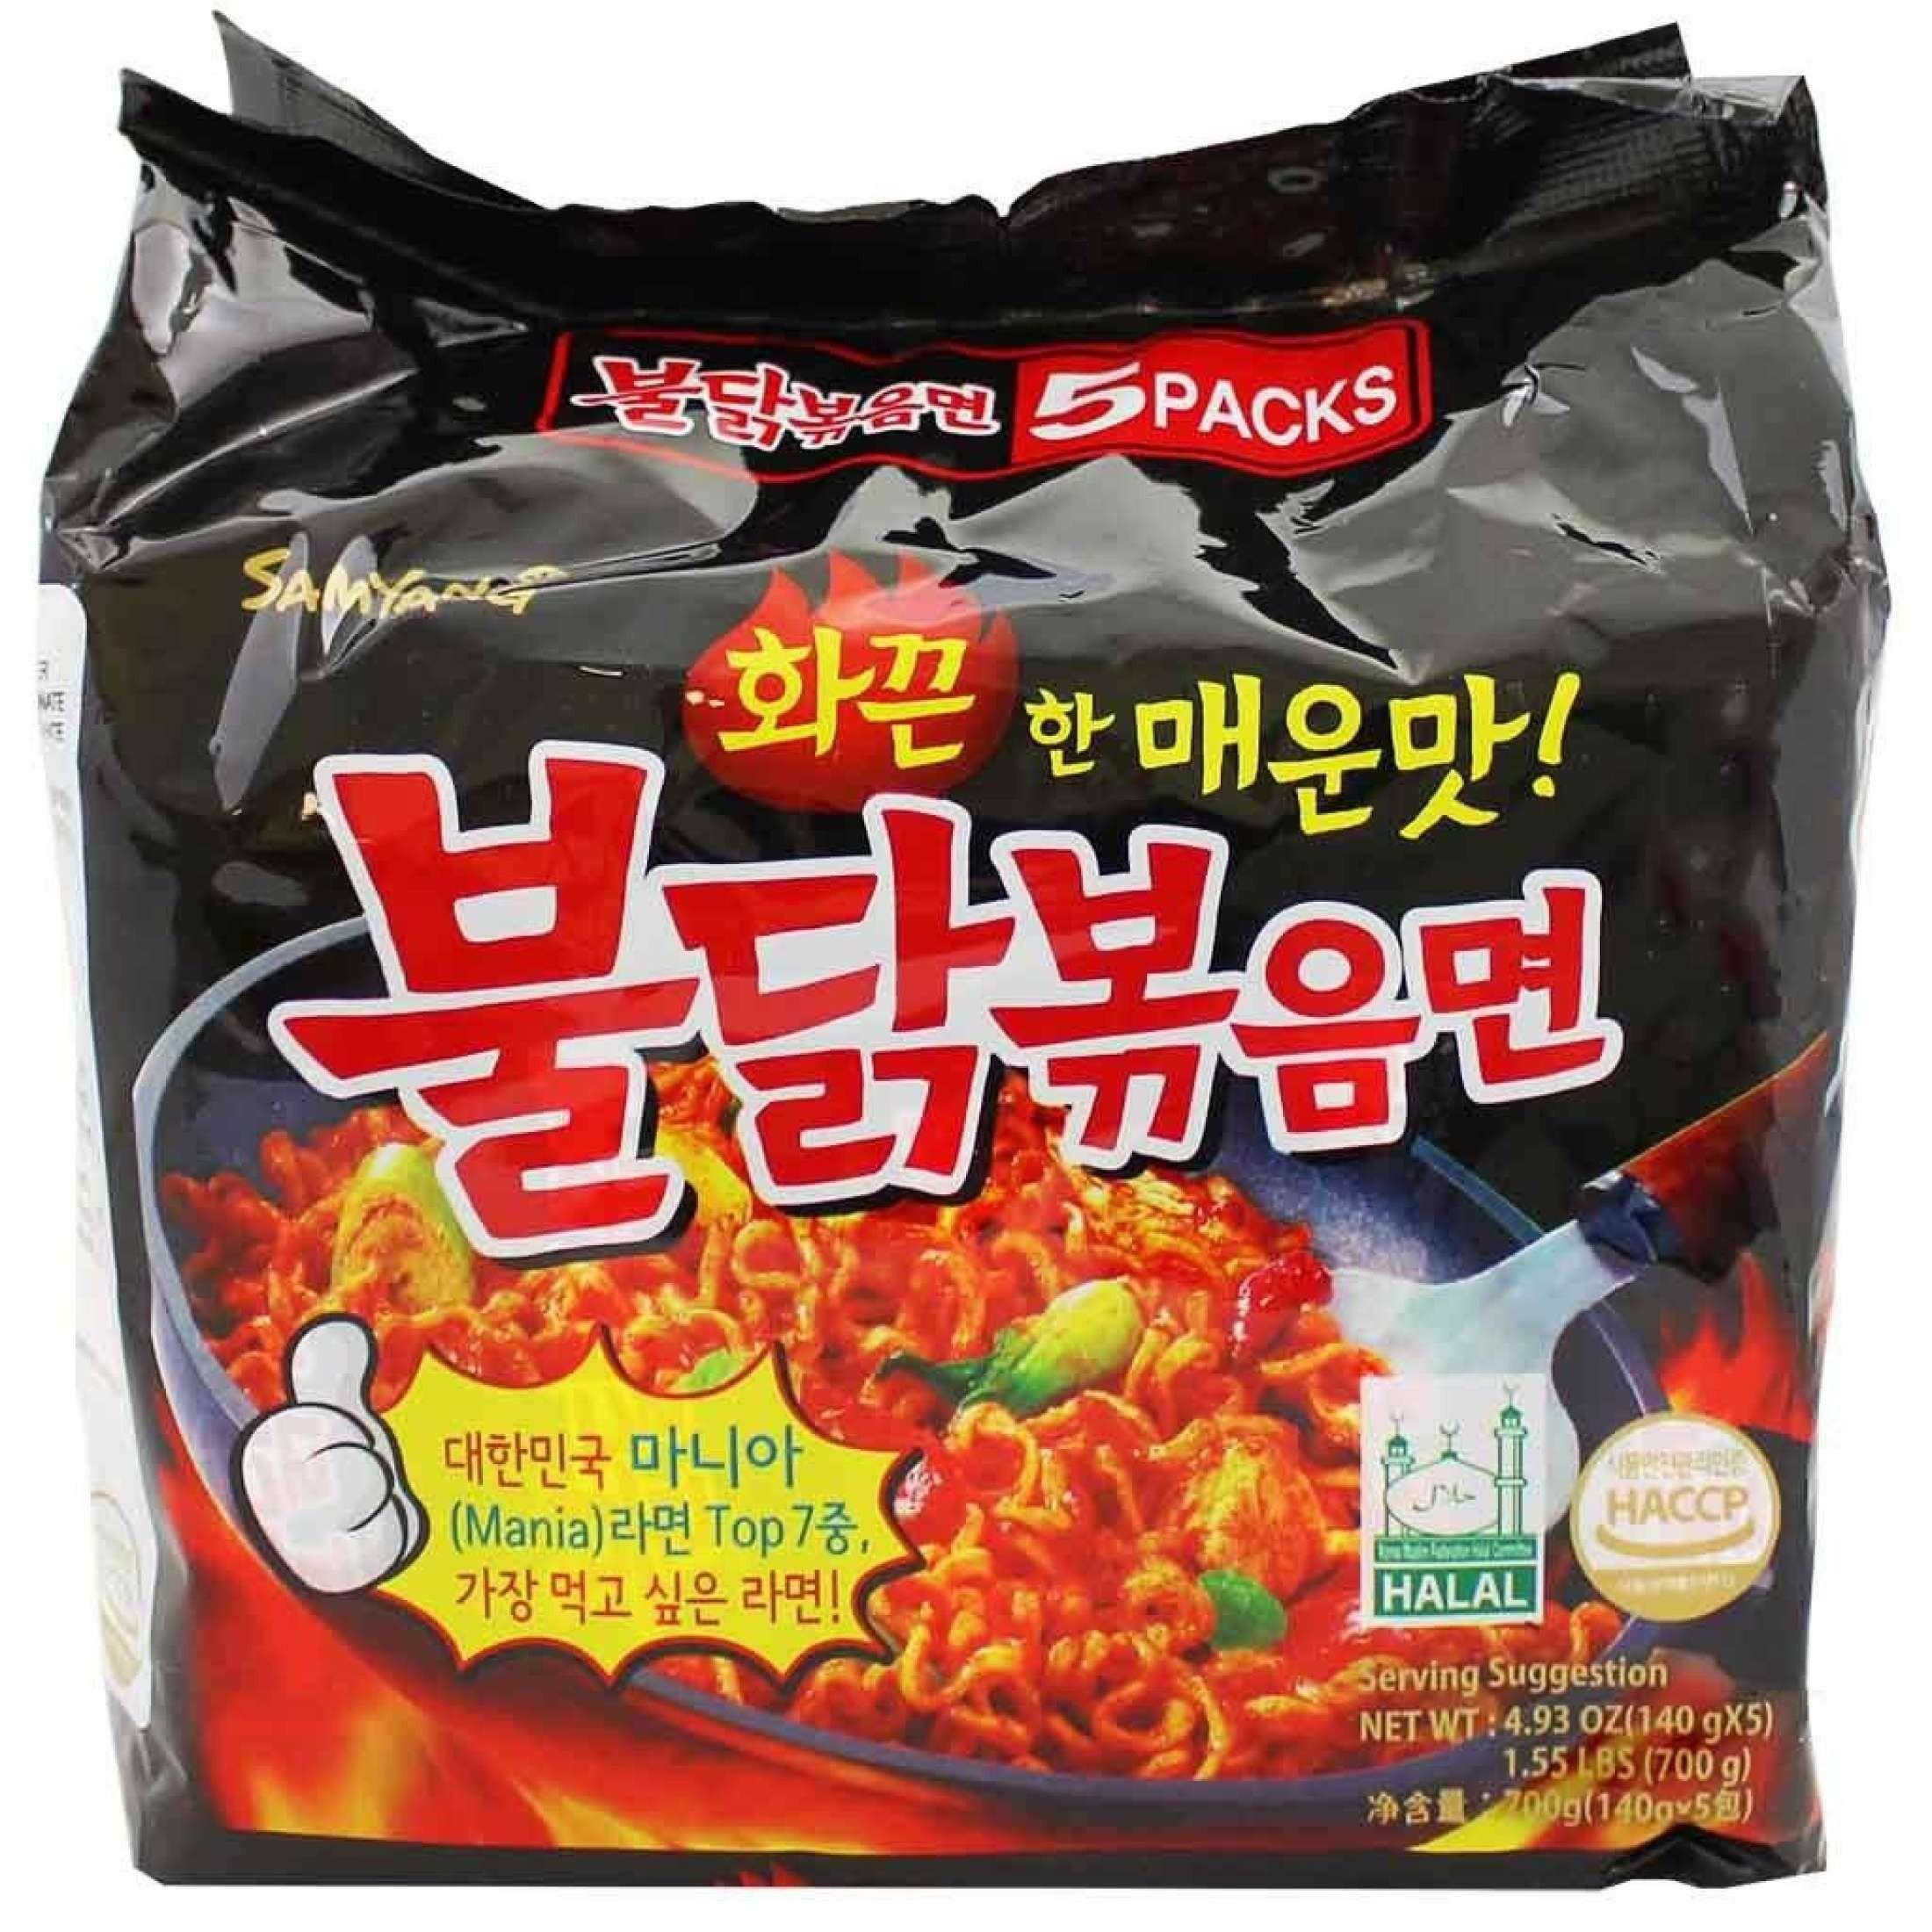 Samyang Hot Chicken Ramyun Halal Packaging